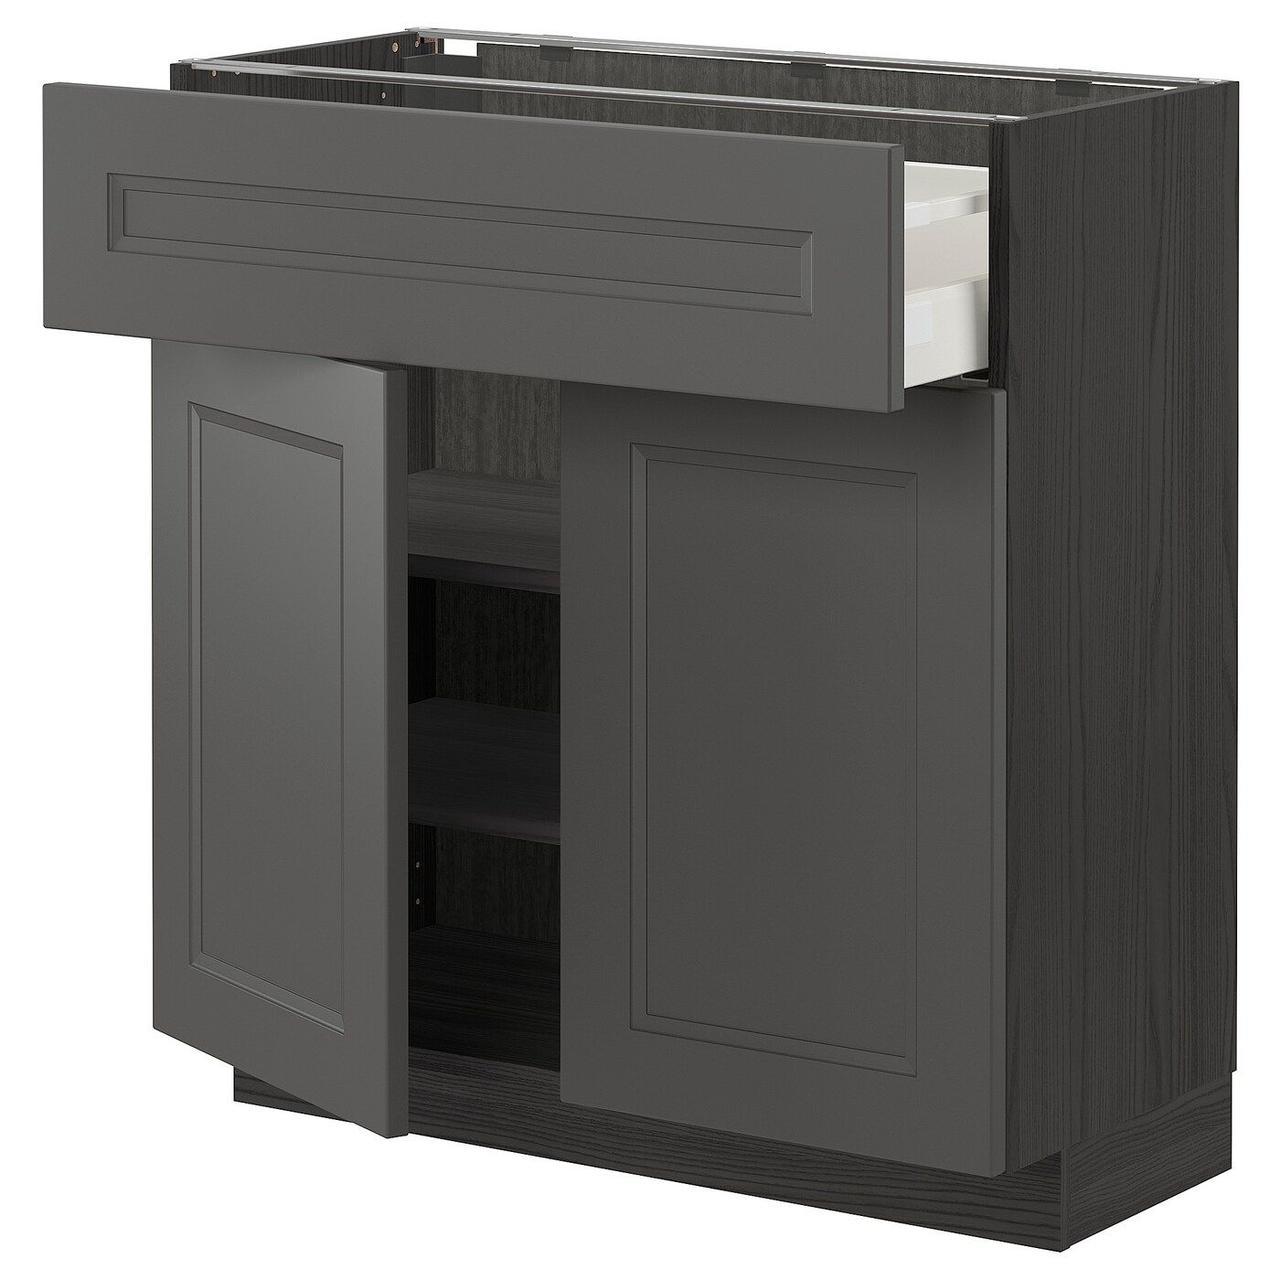 IKEA METOD / MAXIMERA (ІКЕА МЕТОДИ / MAXIMERA) 99322916